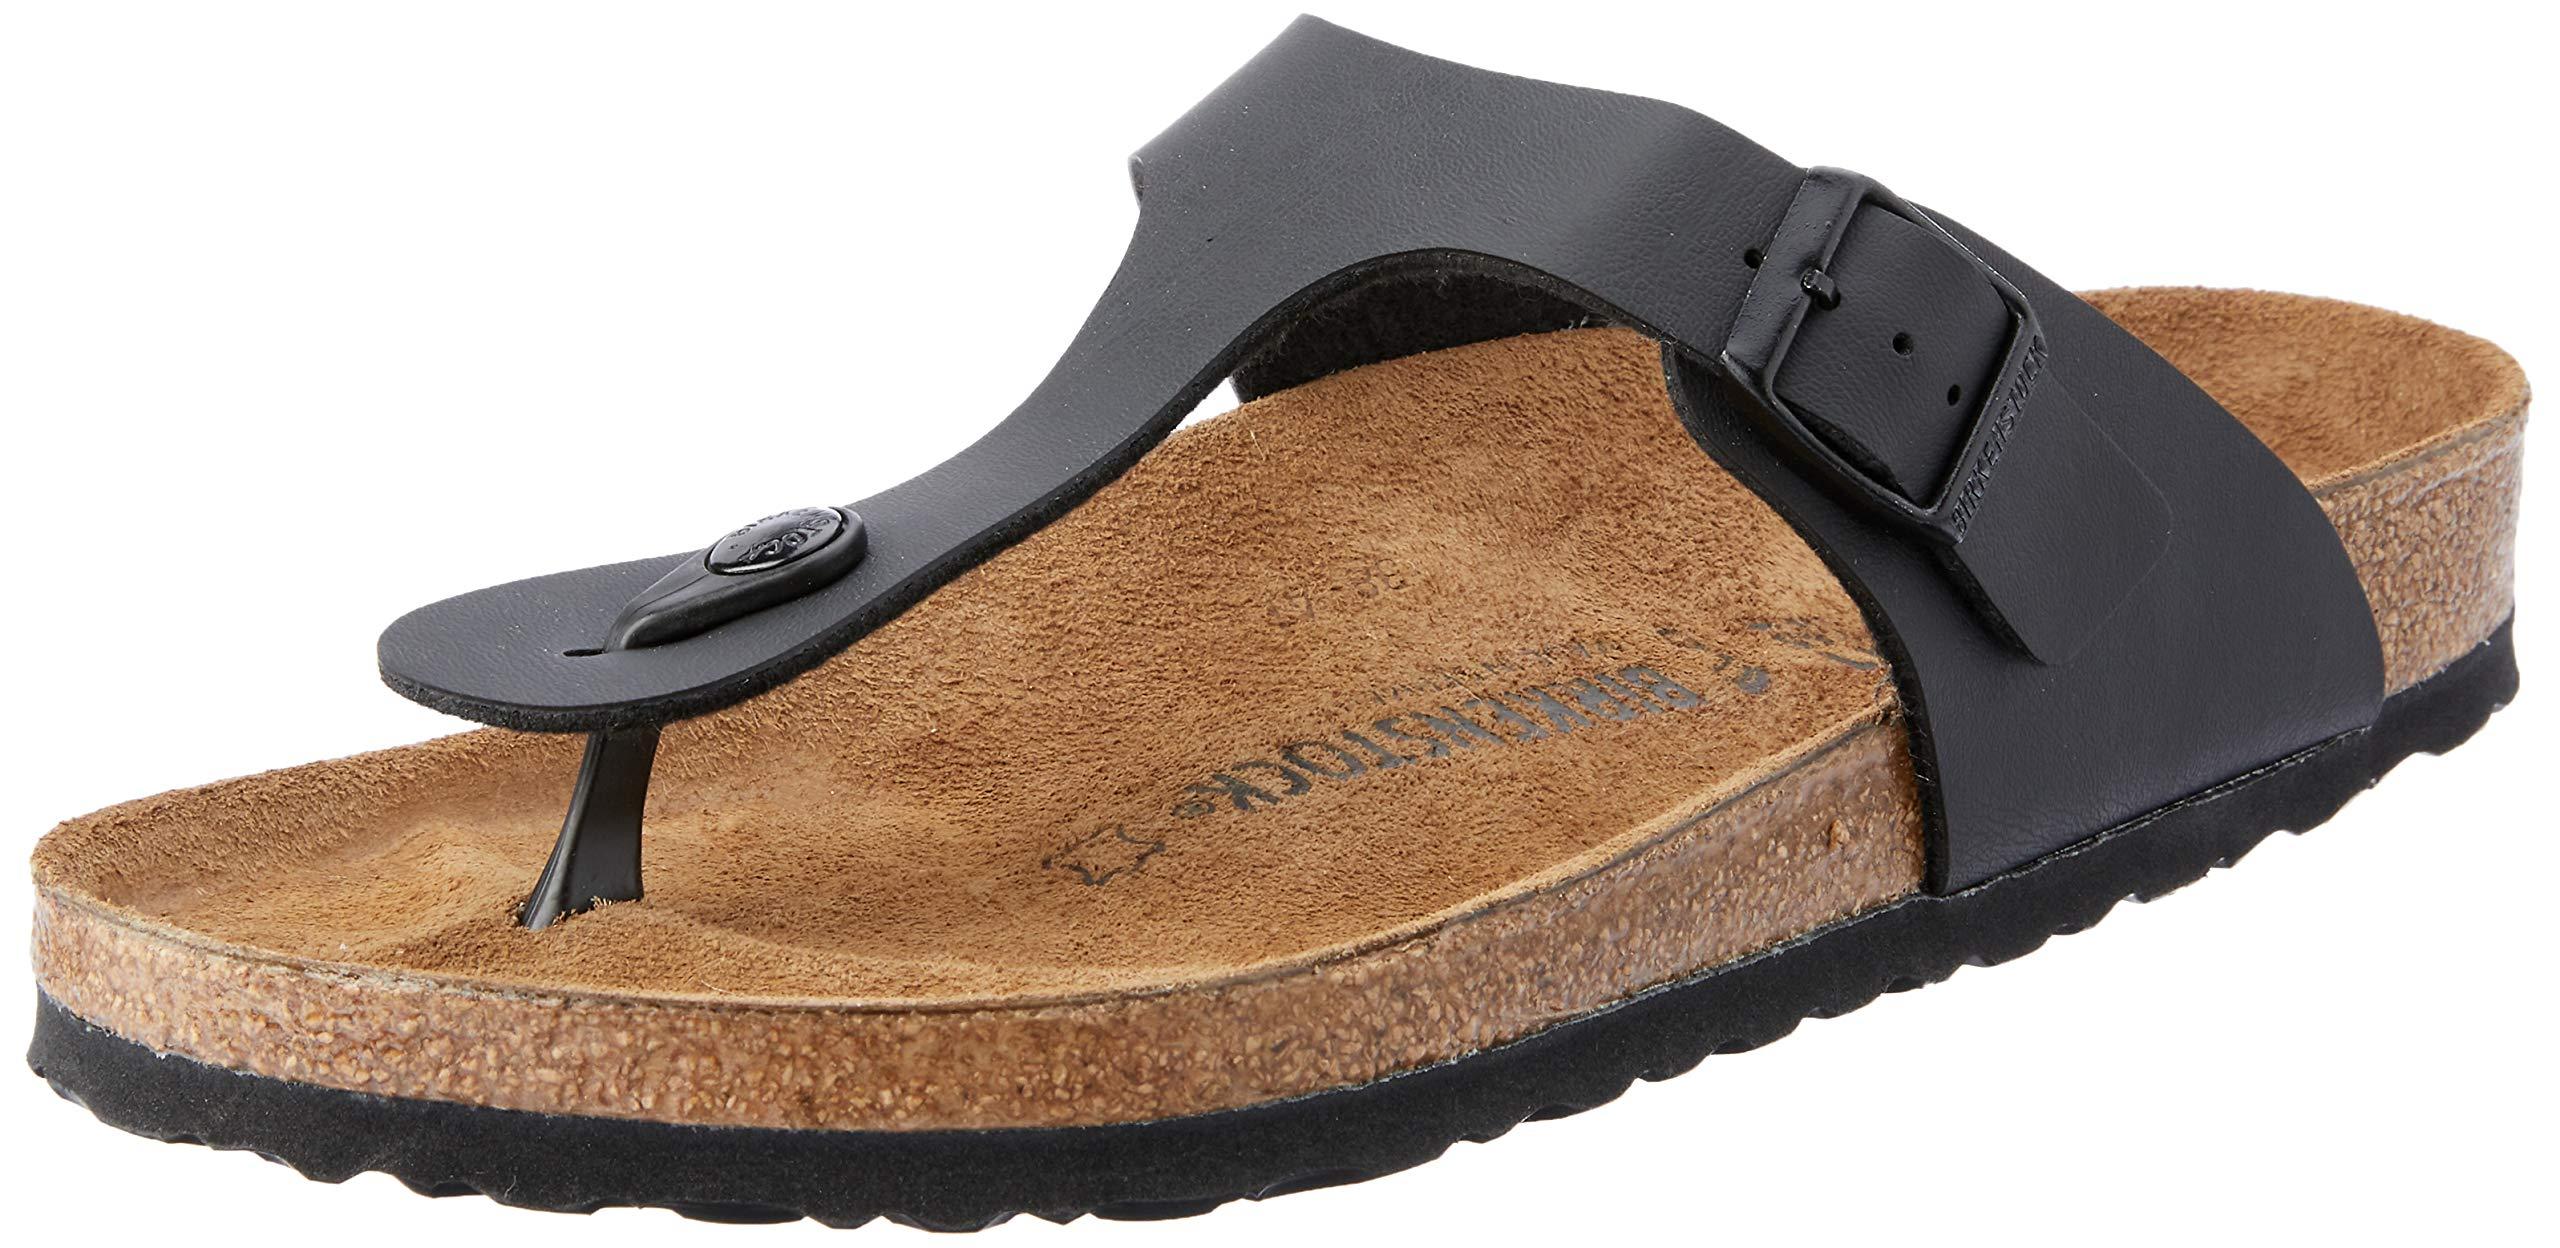 Details about Birkenstock Women's Gizeh Thong Sandals